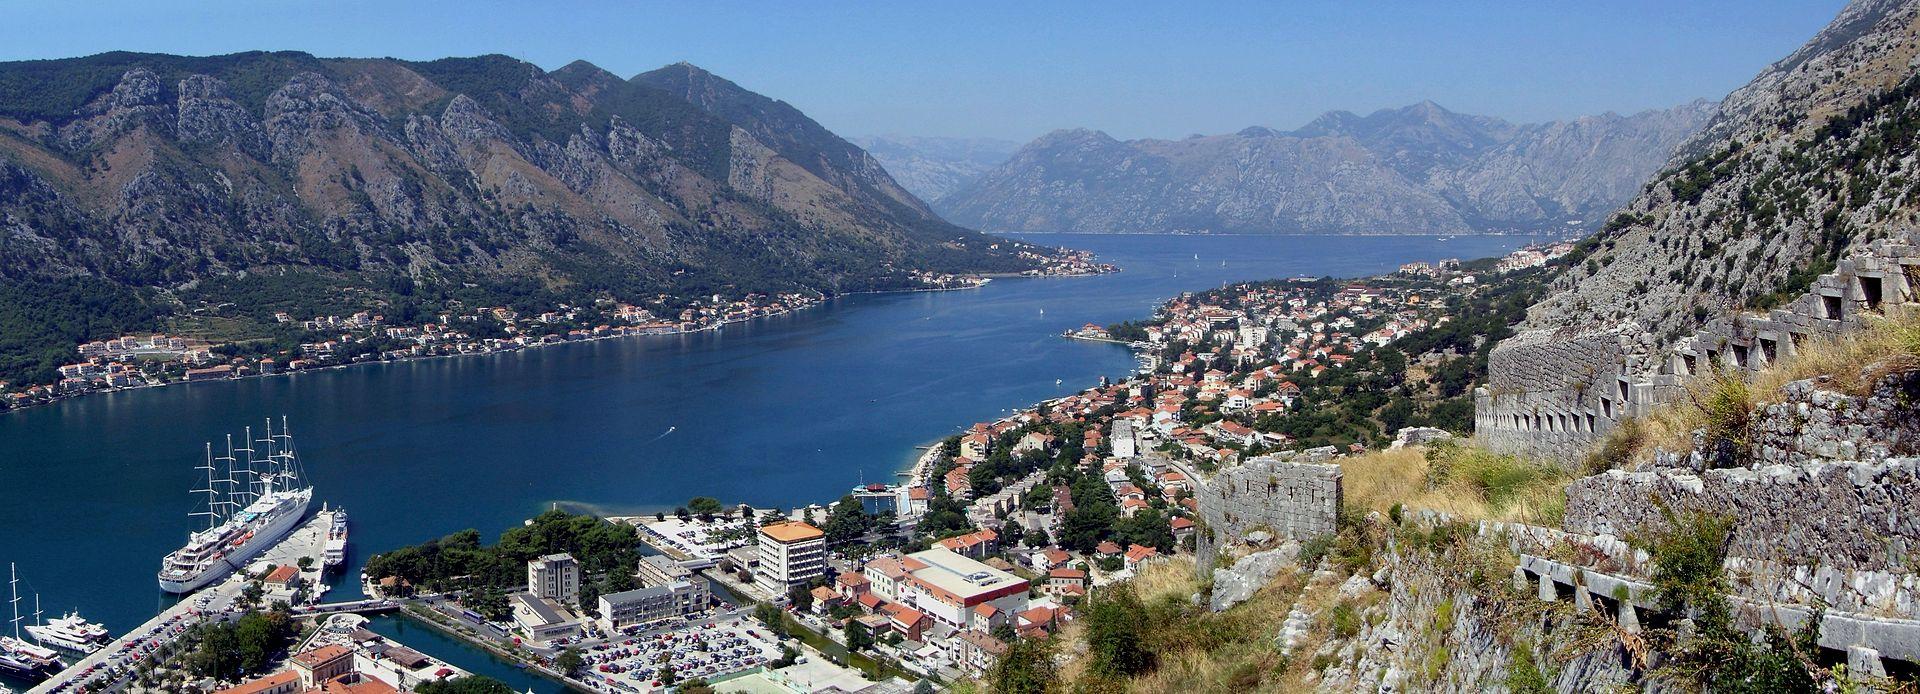 Kotor Crna gora letovanje Herceg novi ponude